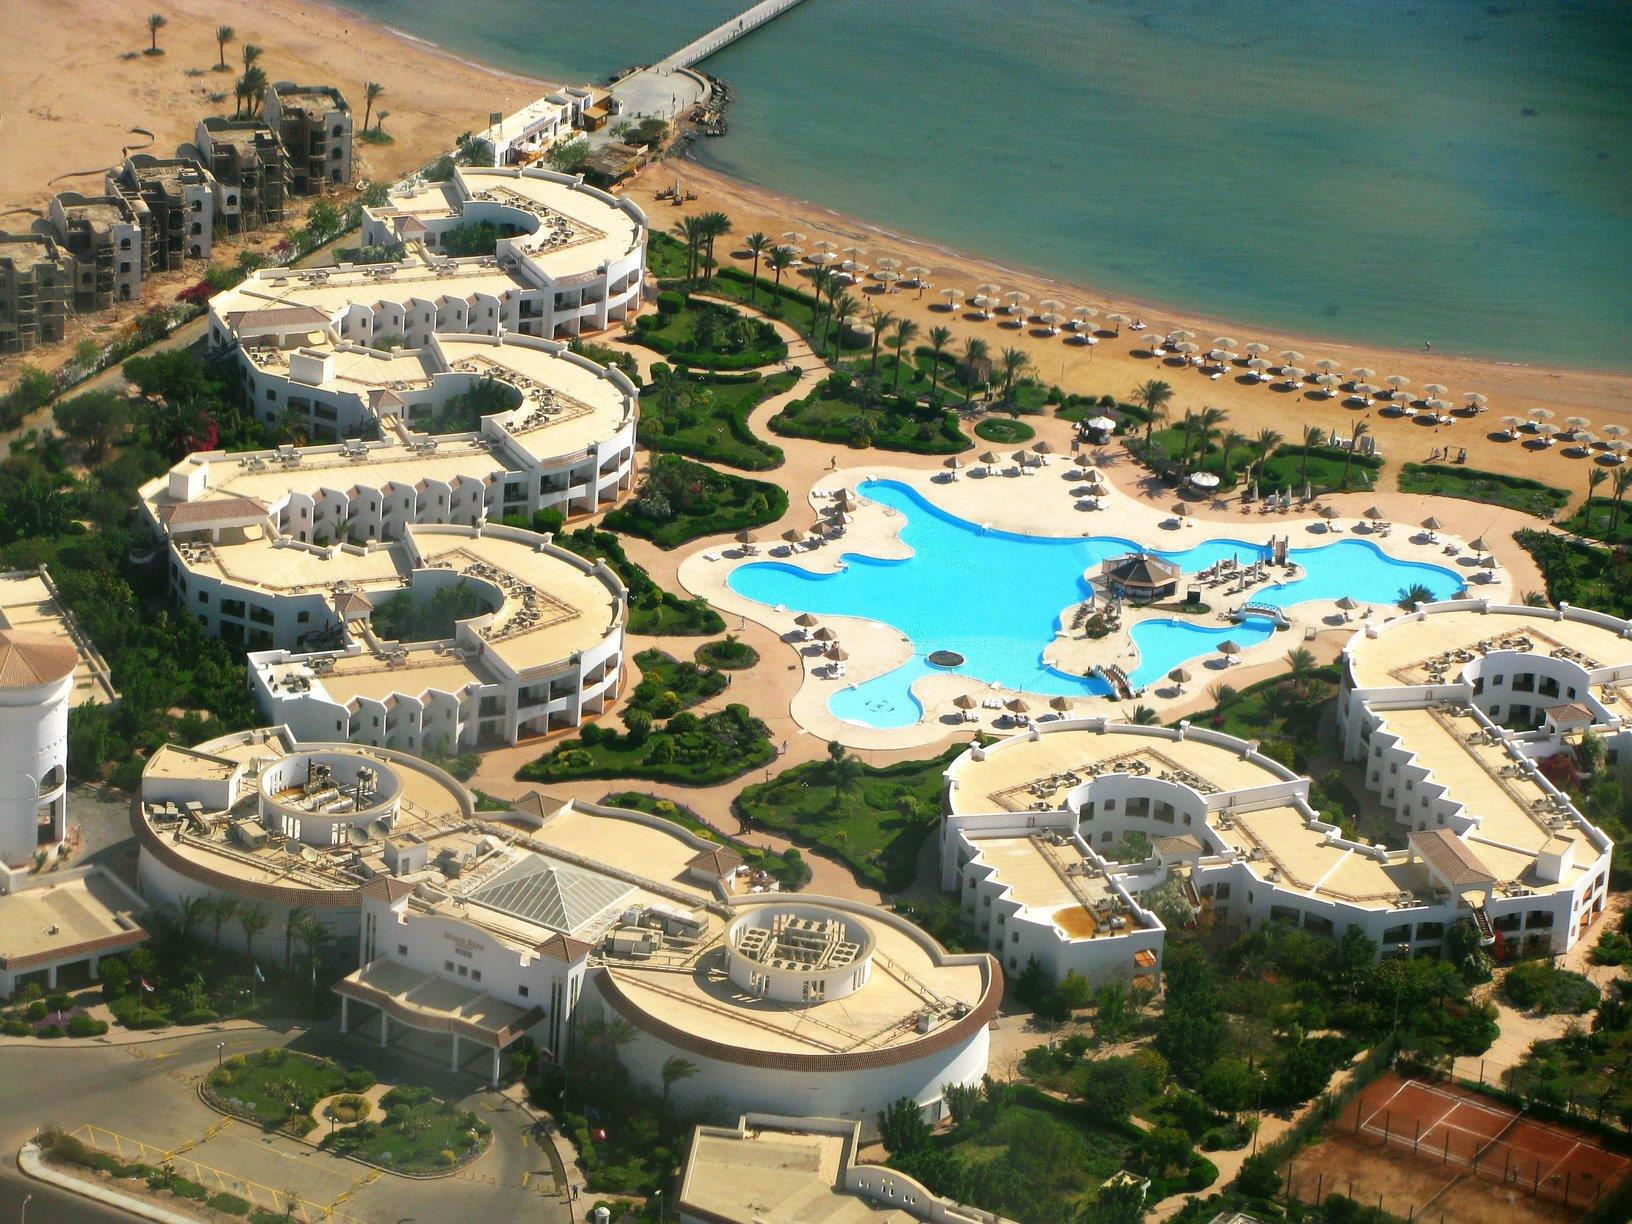 grand-seas-resort-hostmark-genel-002